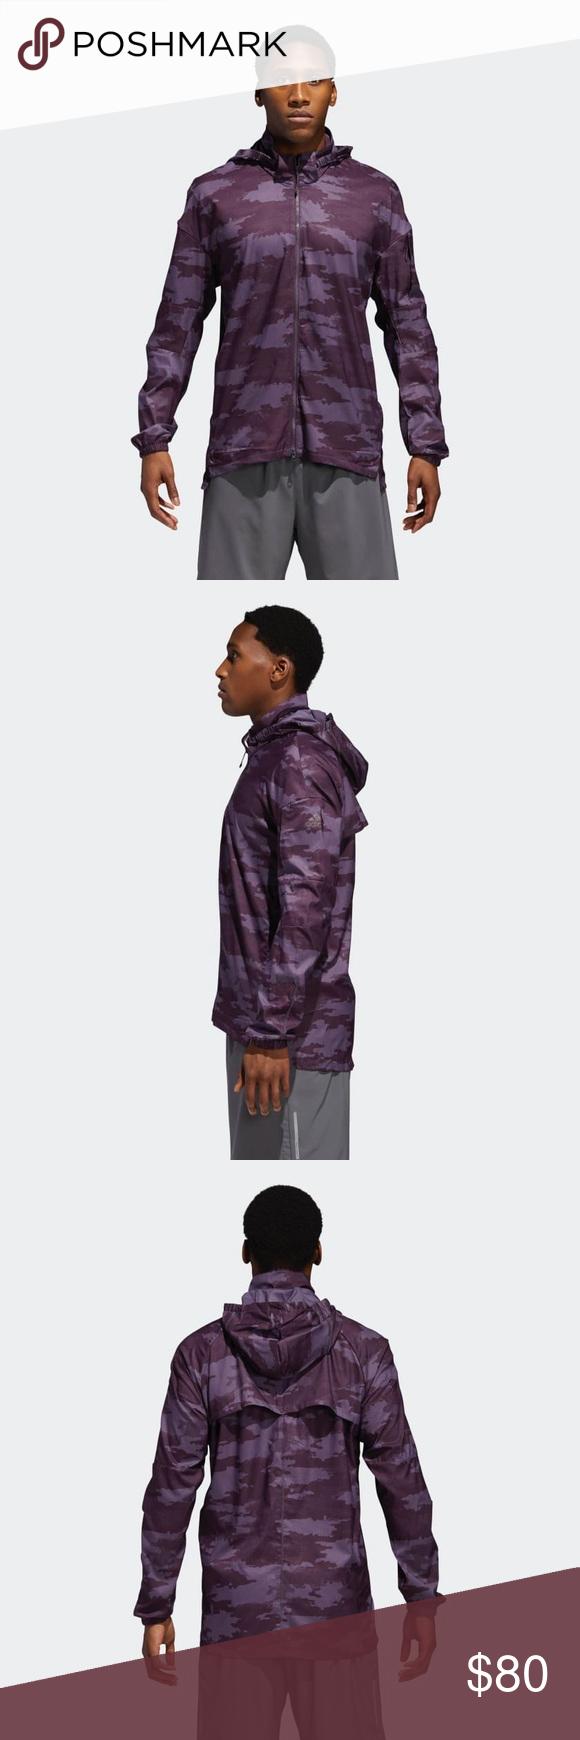 792dc8a913d75 NWT Men s Adidas Supernova TKO DPR Jacket The jacket s water-repellent  coating keeps you dry